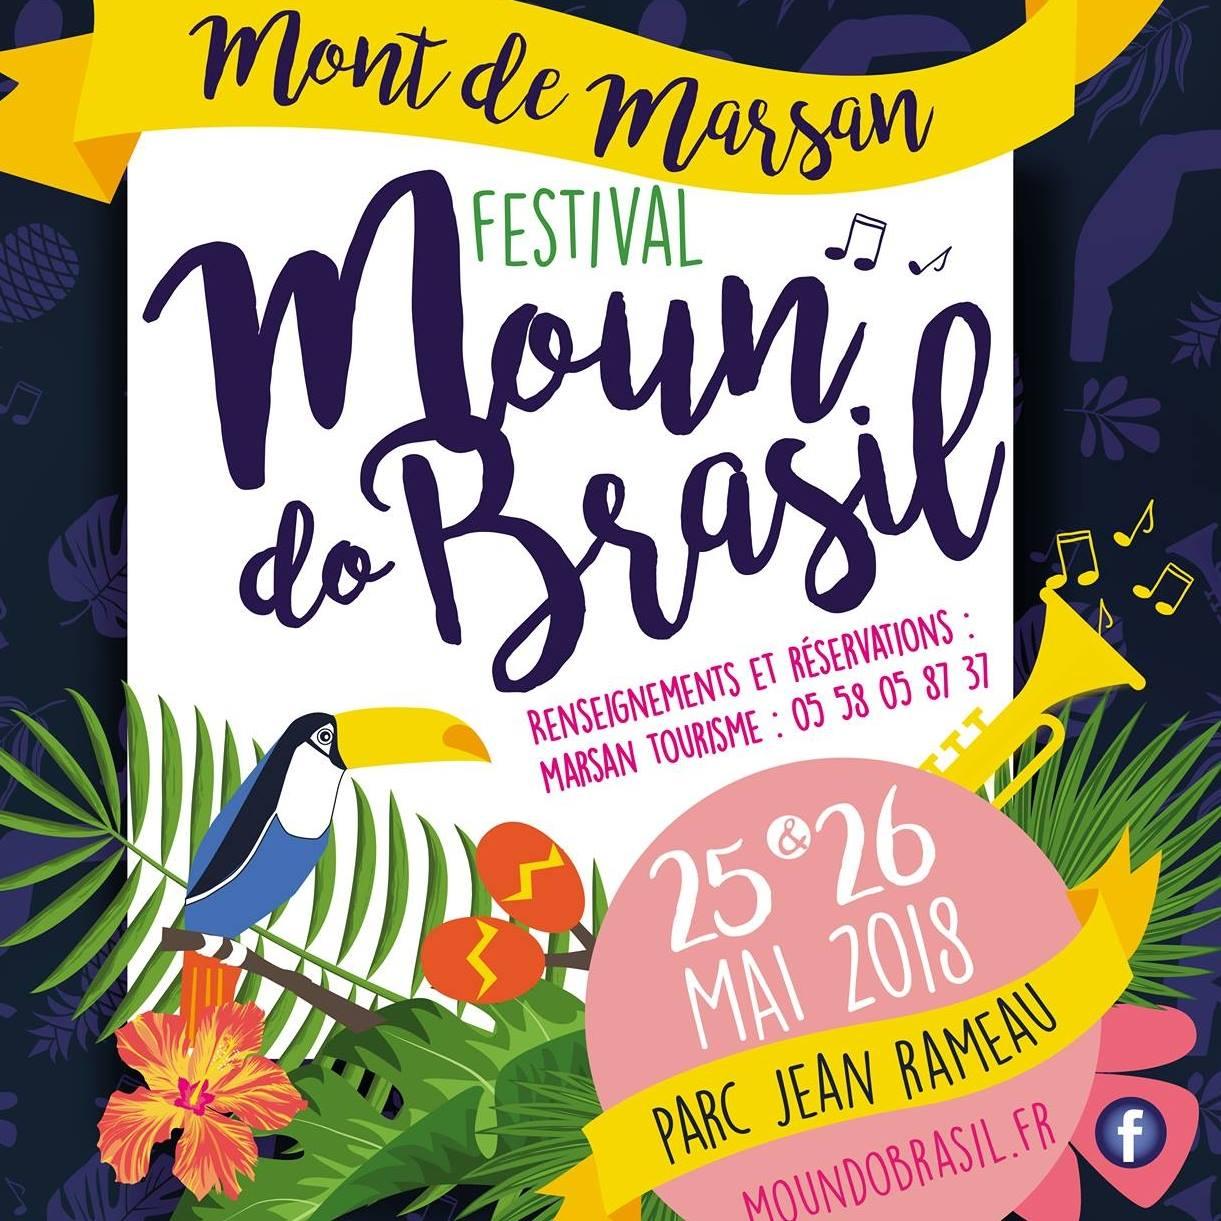 image : Affiche Moun do Brasil